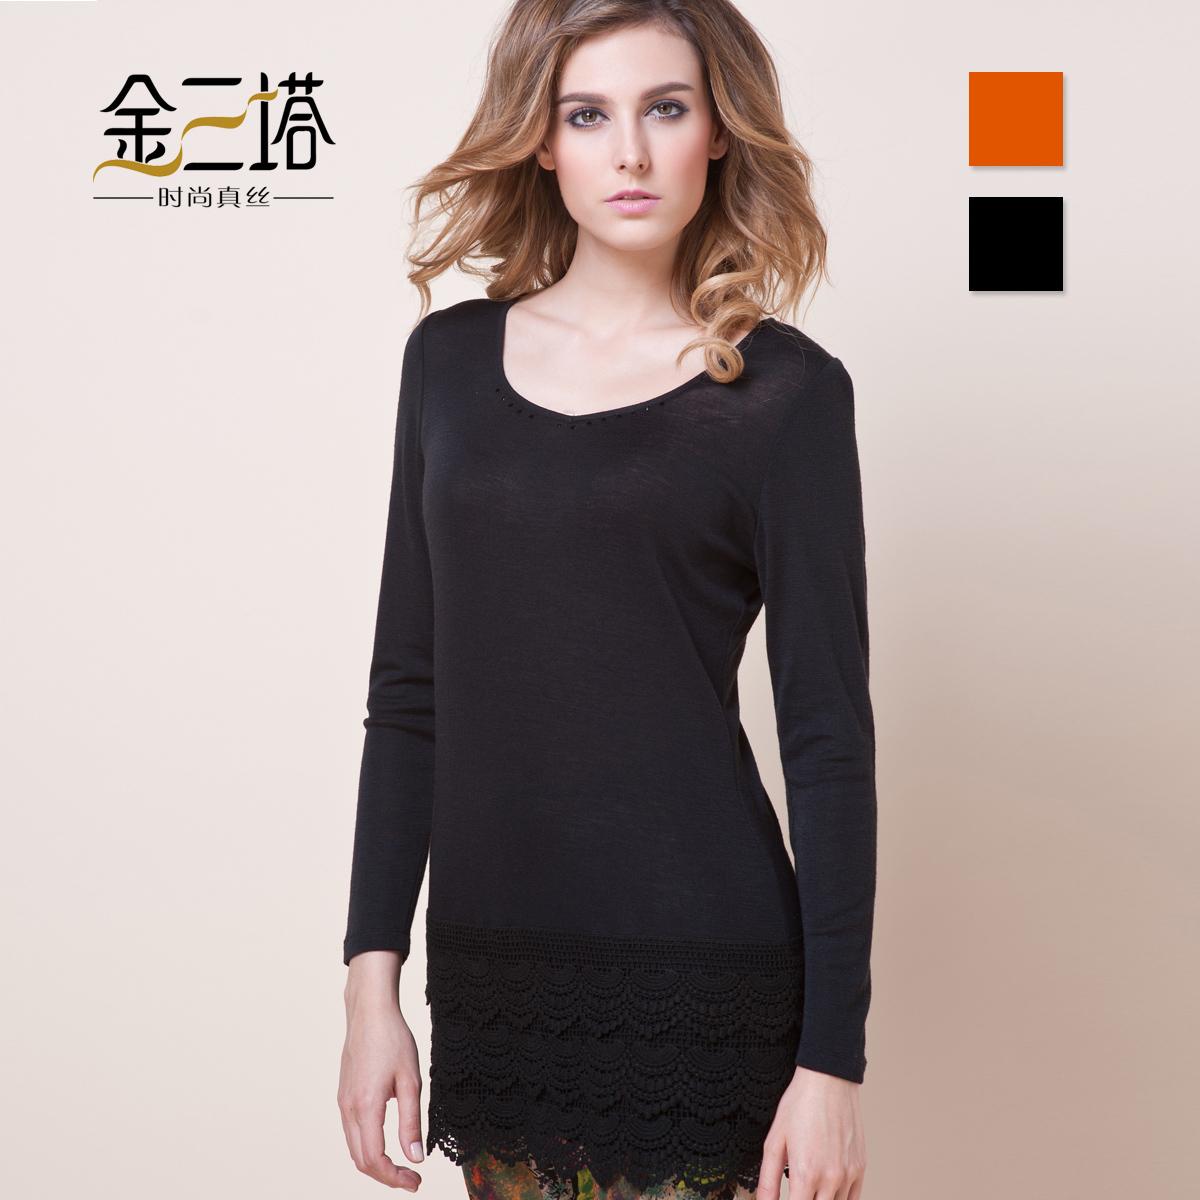 free shipping Silk wool autumn lace low all-match long-sleeve Women t-shirt basic shirt yzf2c709